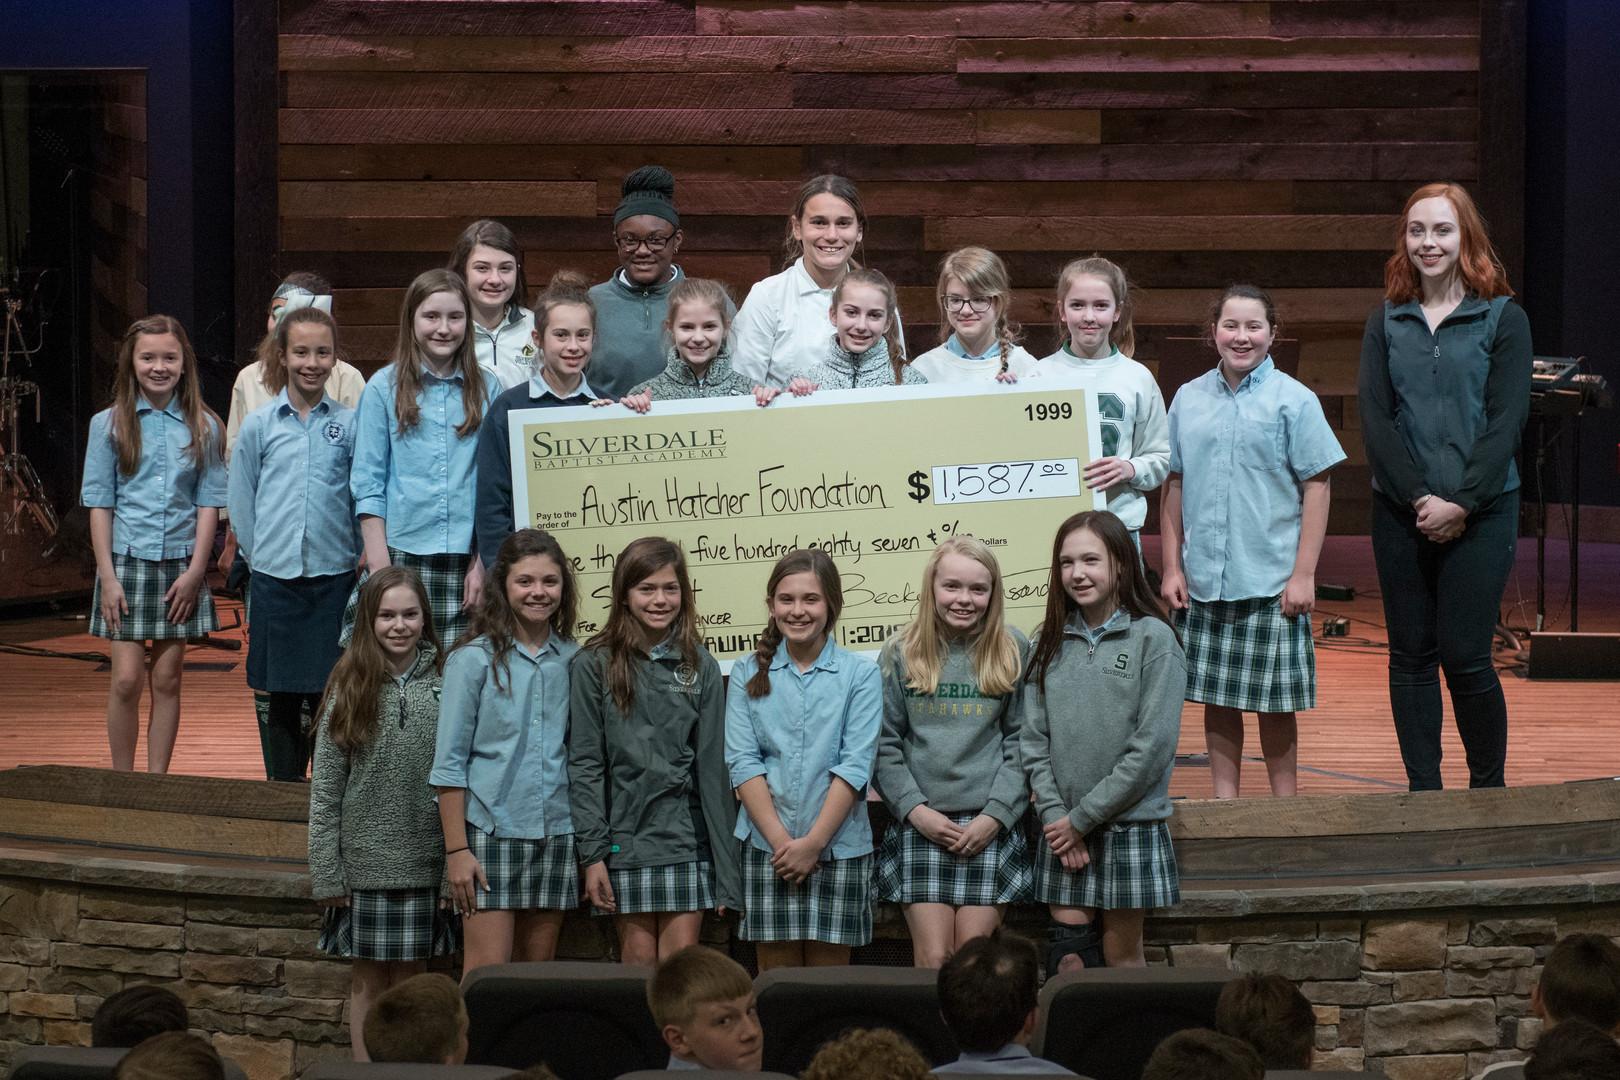 Silverdale Baptist Academy